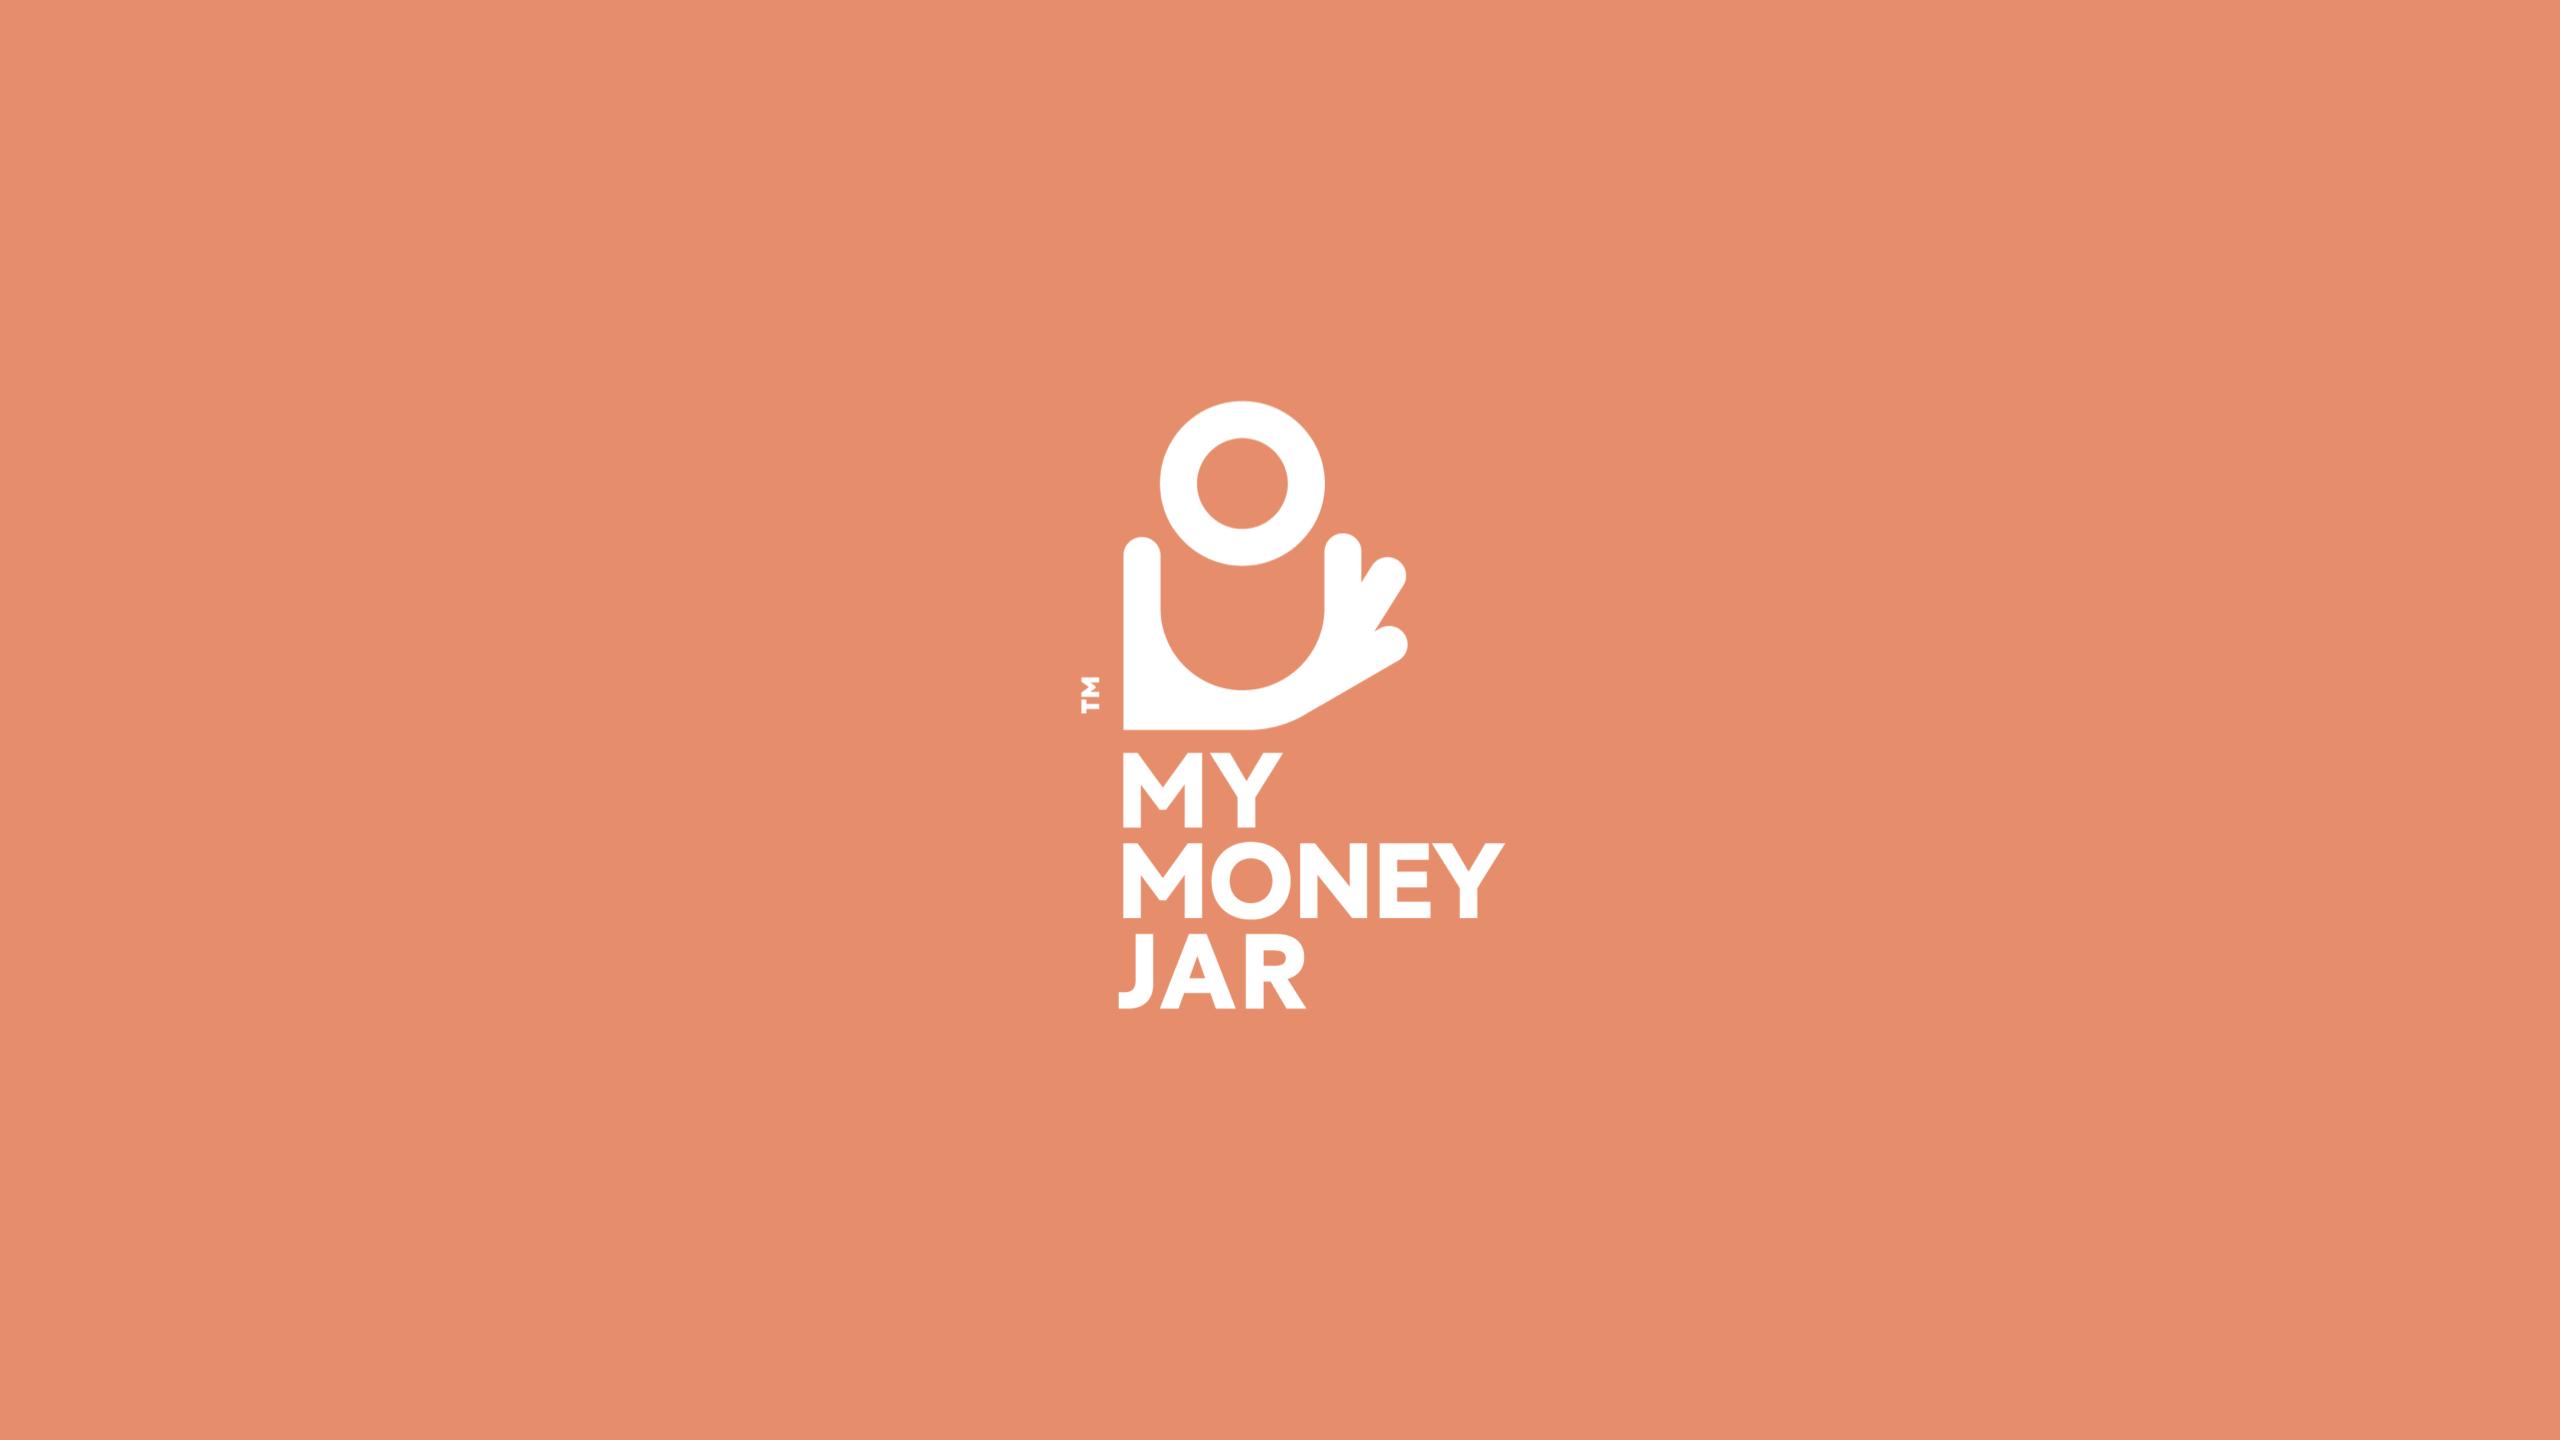 Cover image: My Money Jar